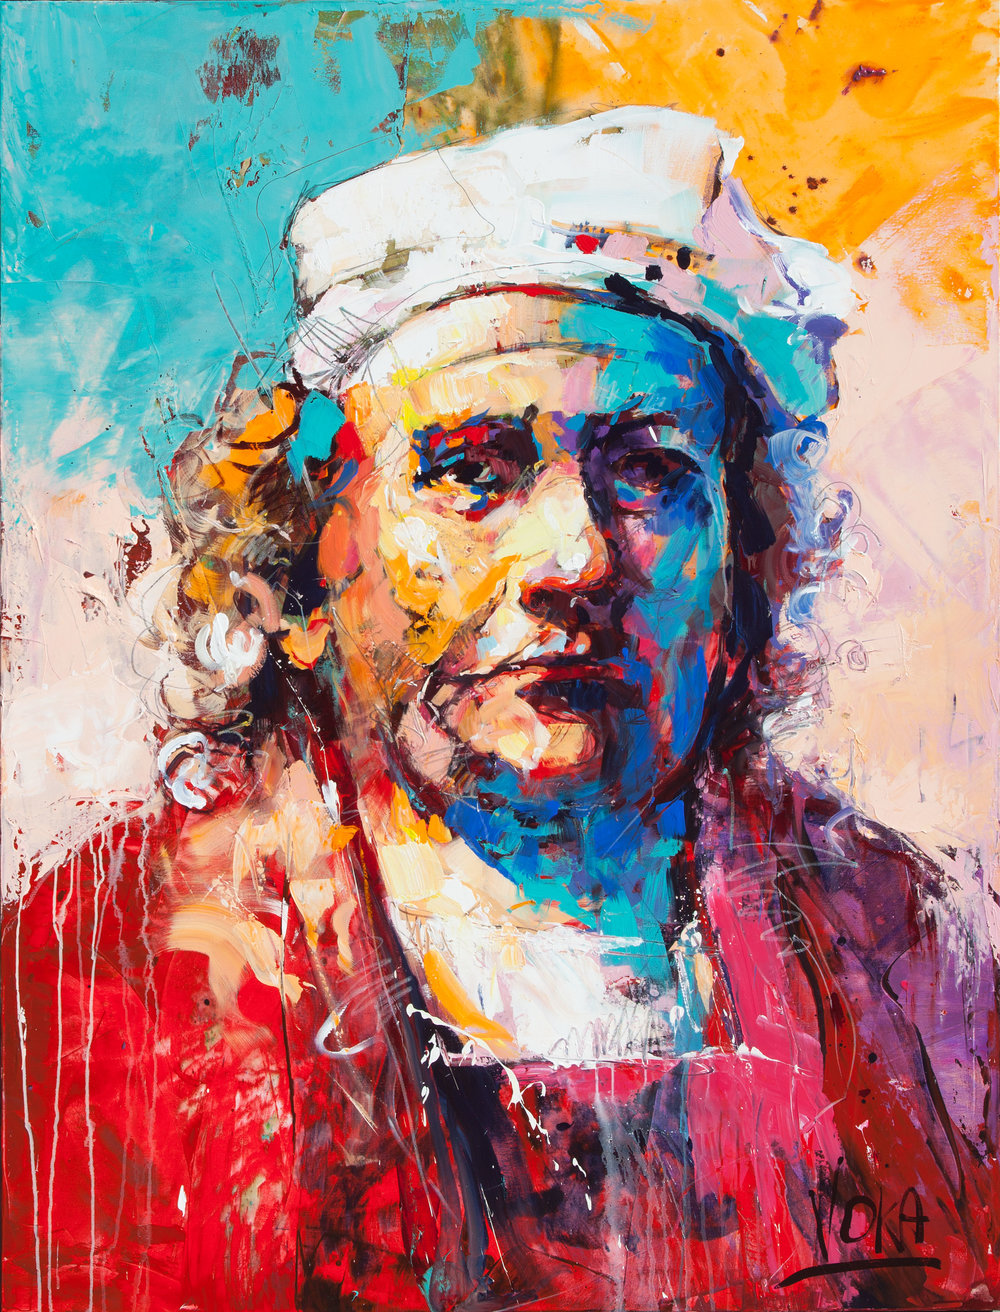 Rembrandt van Rijn, 200X150cm / 78,7X59,1 inch, Acrylic on Canvas